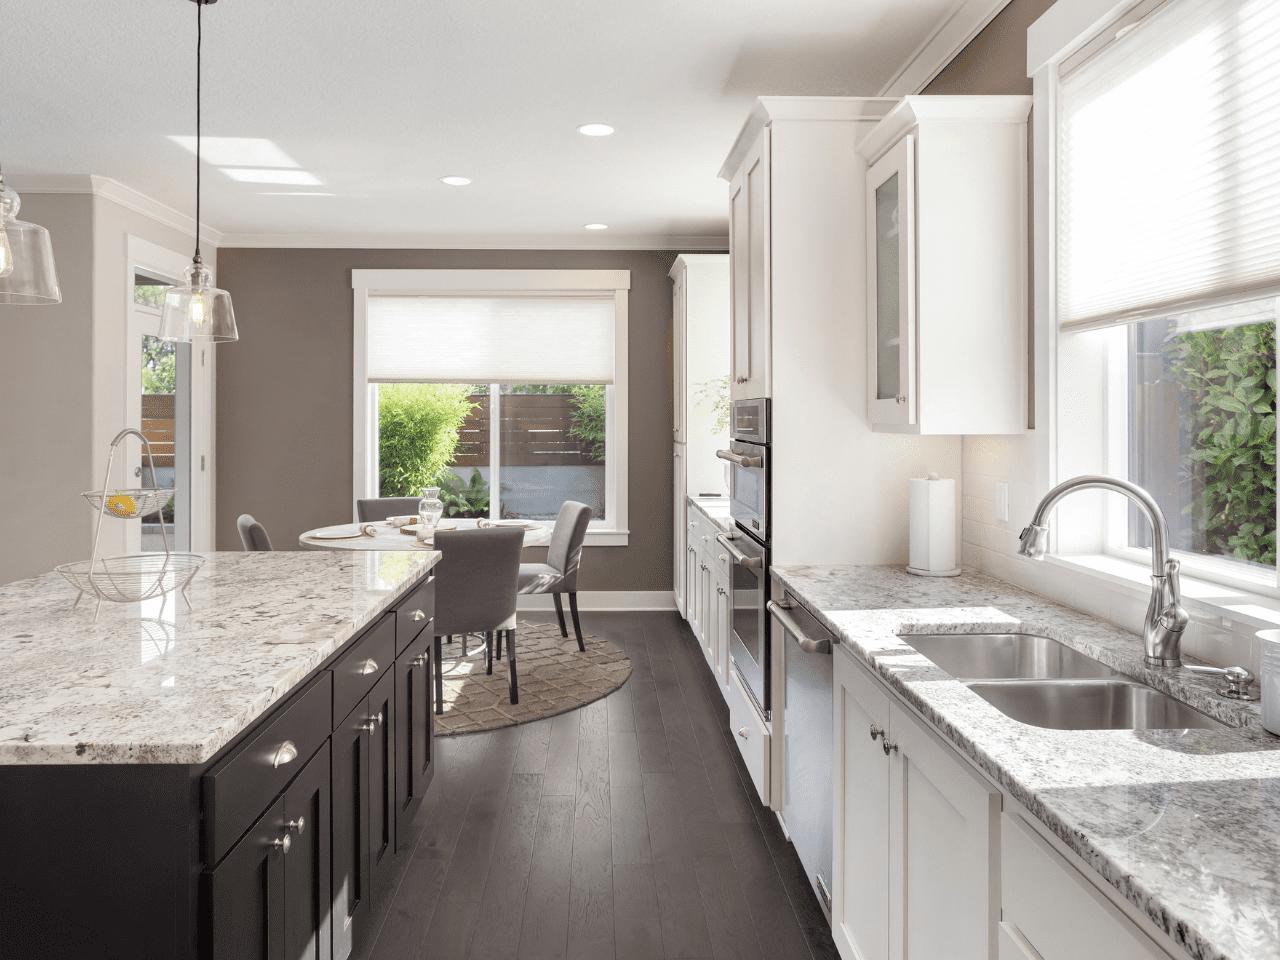 abbinare cucina e pavimento 2